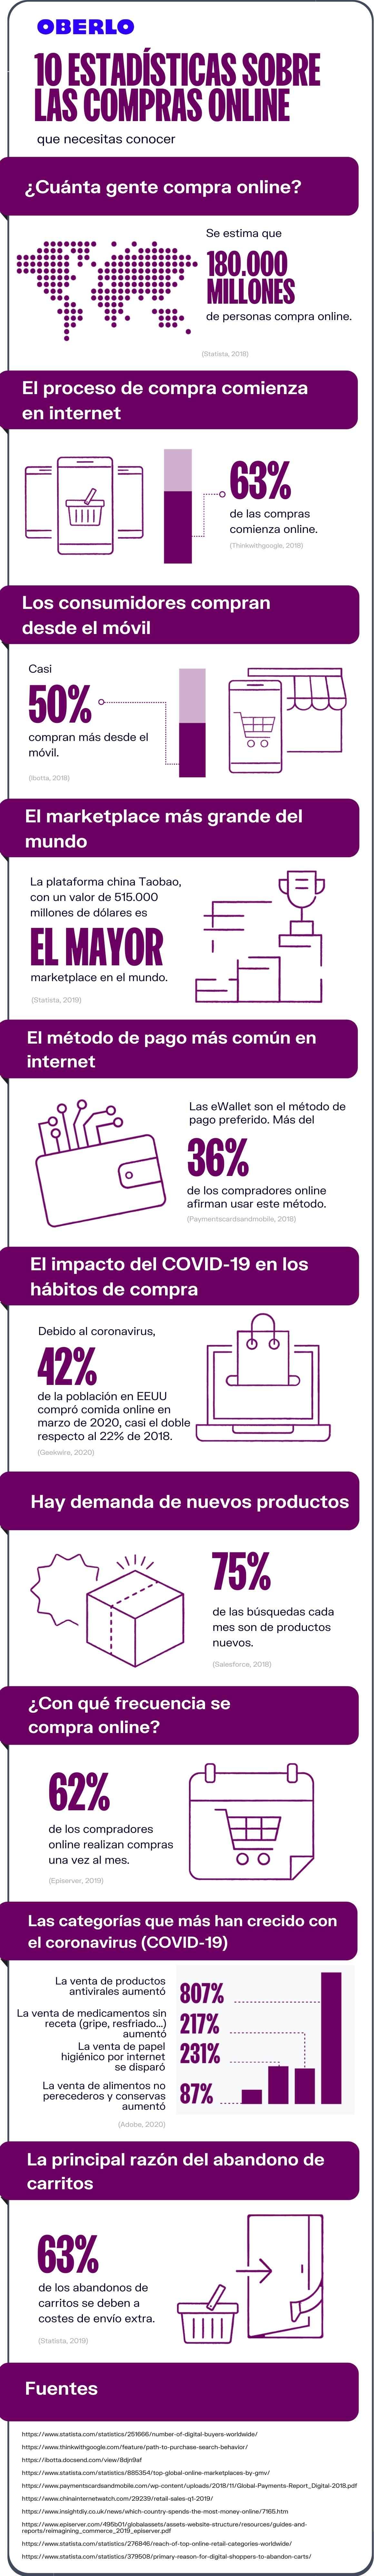 Datos compras online